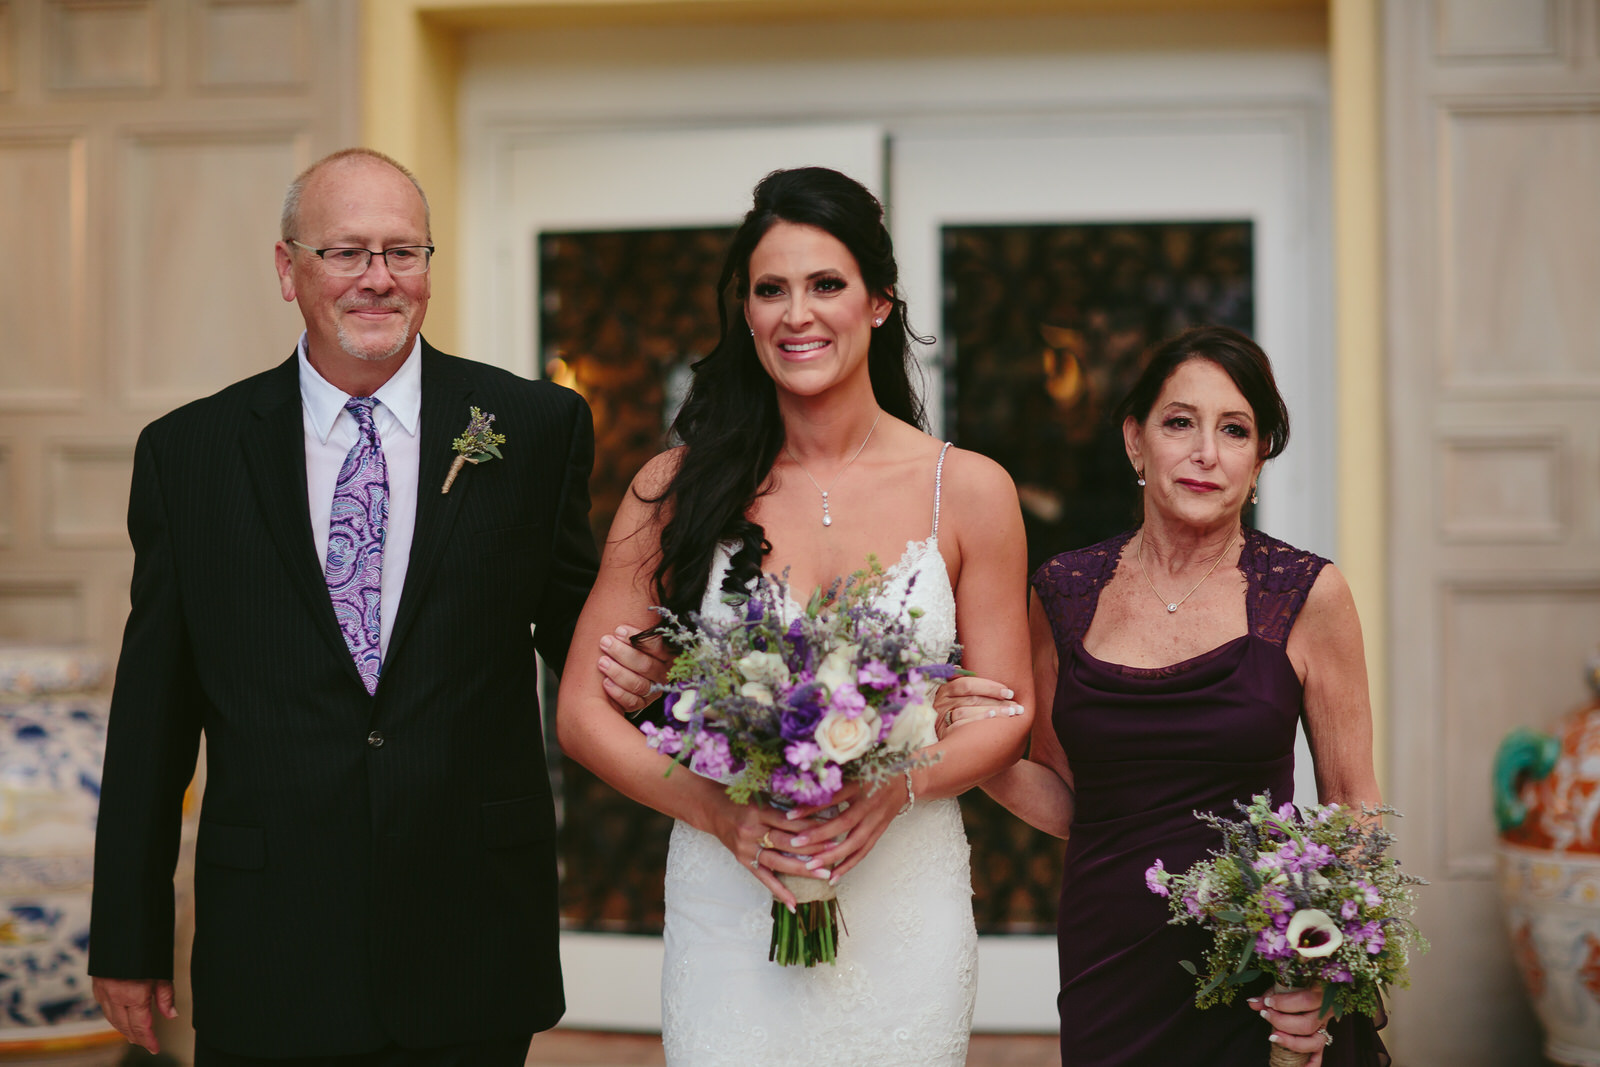 bride_aisle_parents_addison_boca_wedding_photographer_tiny_house_photo.jpg